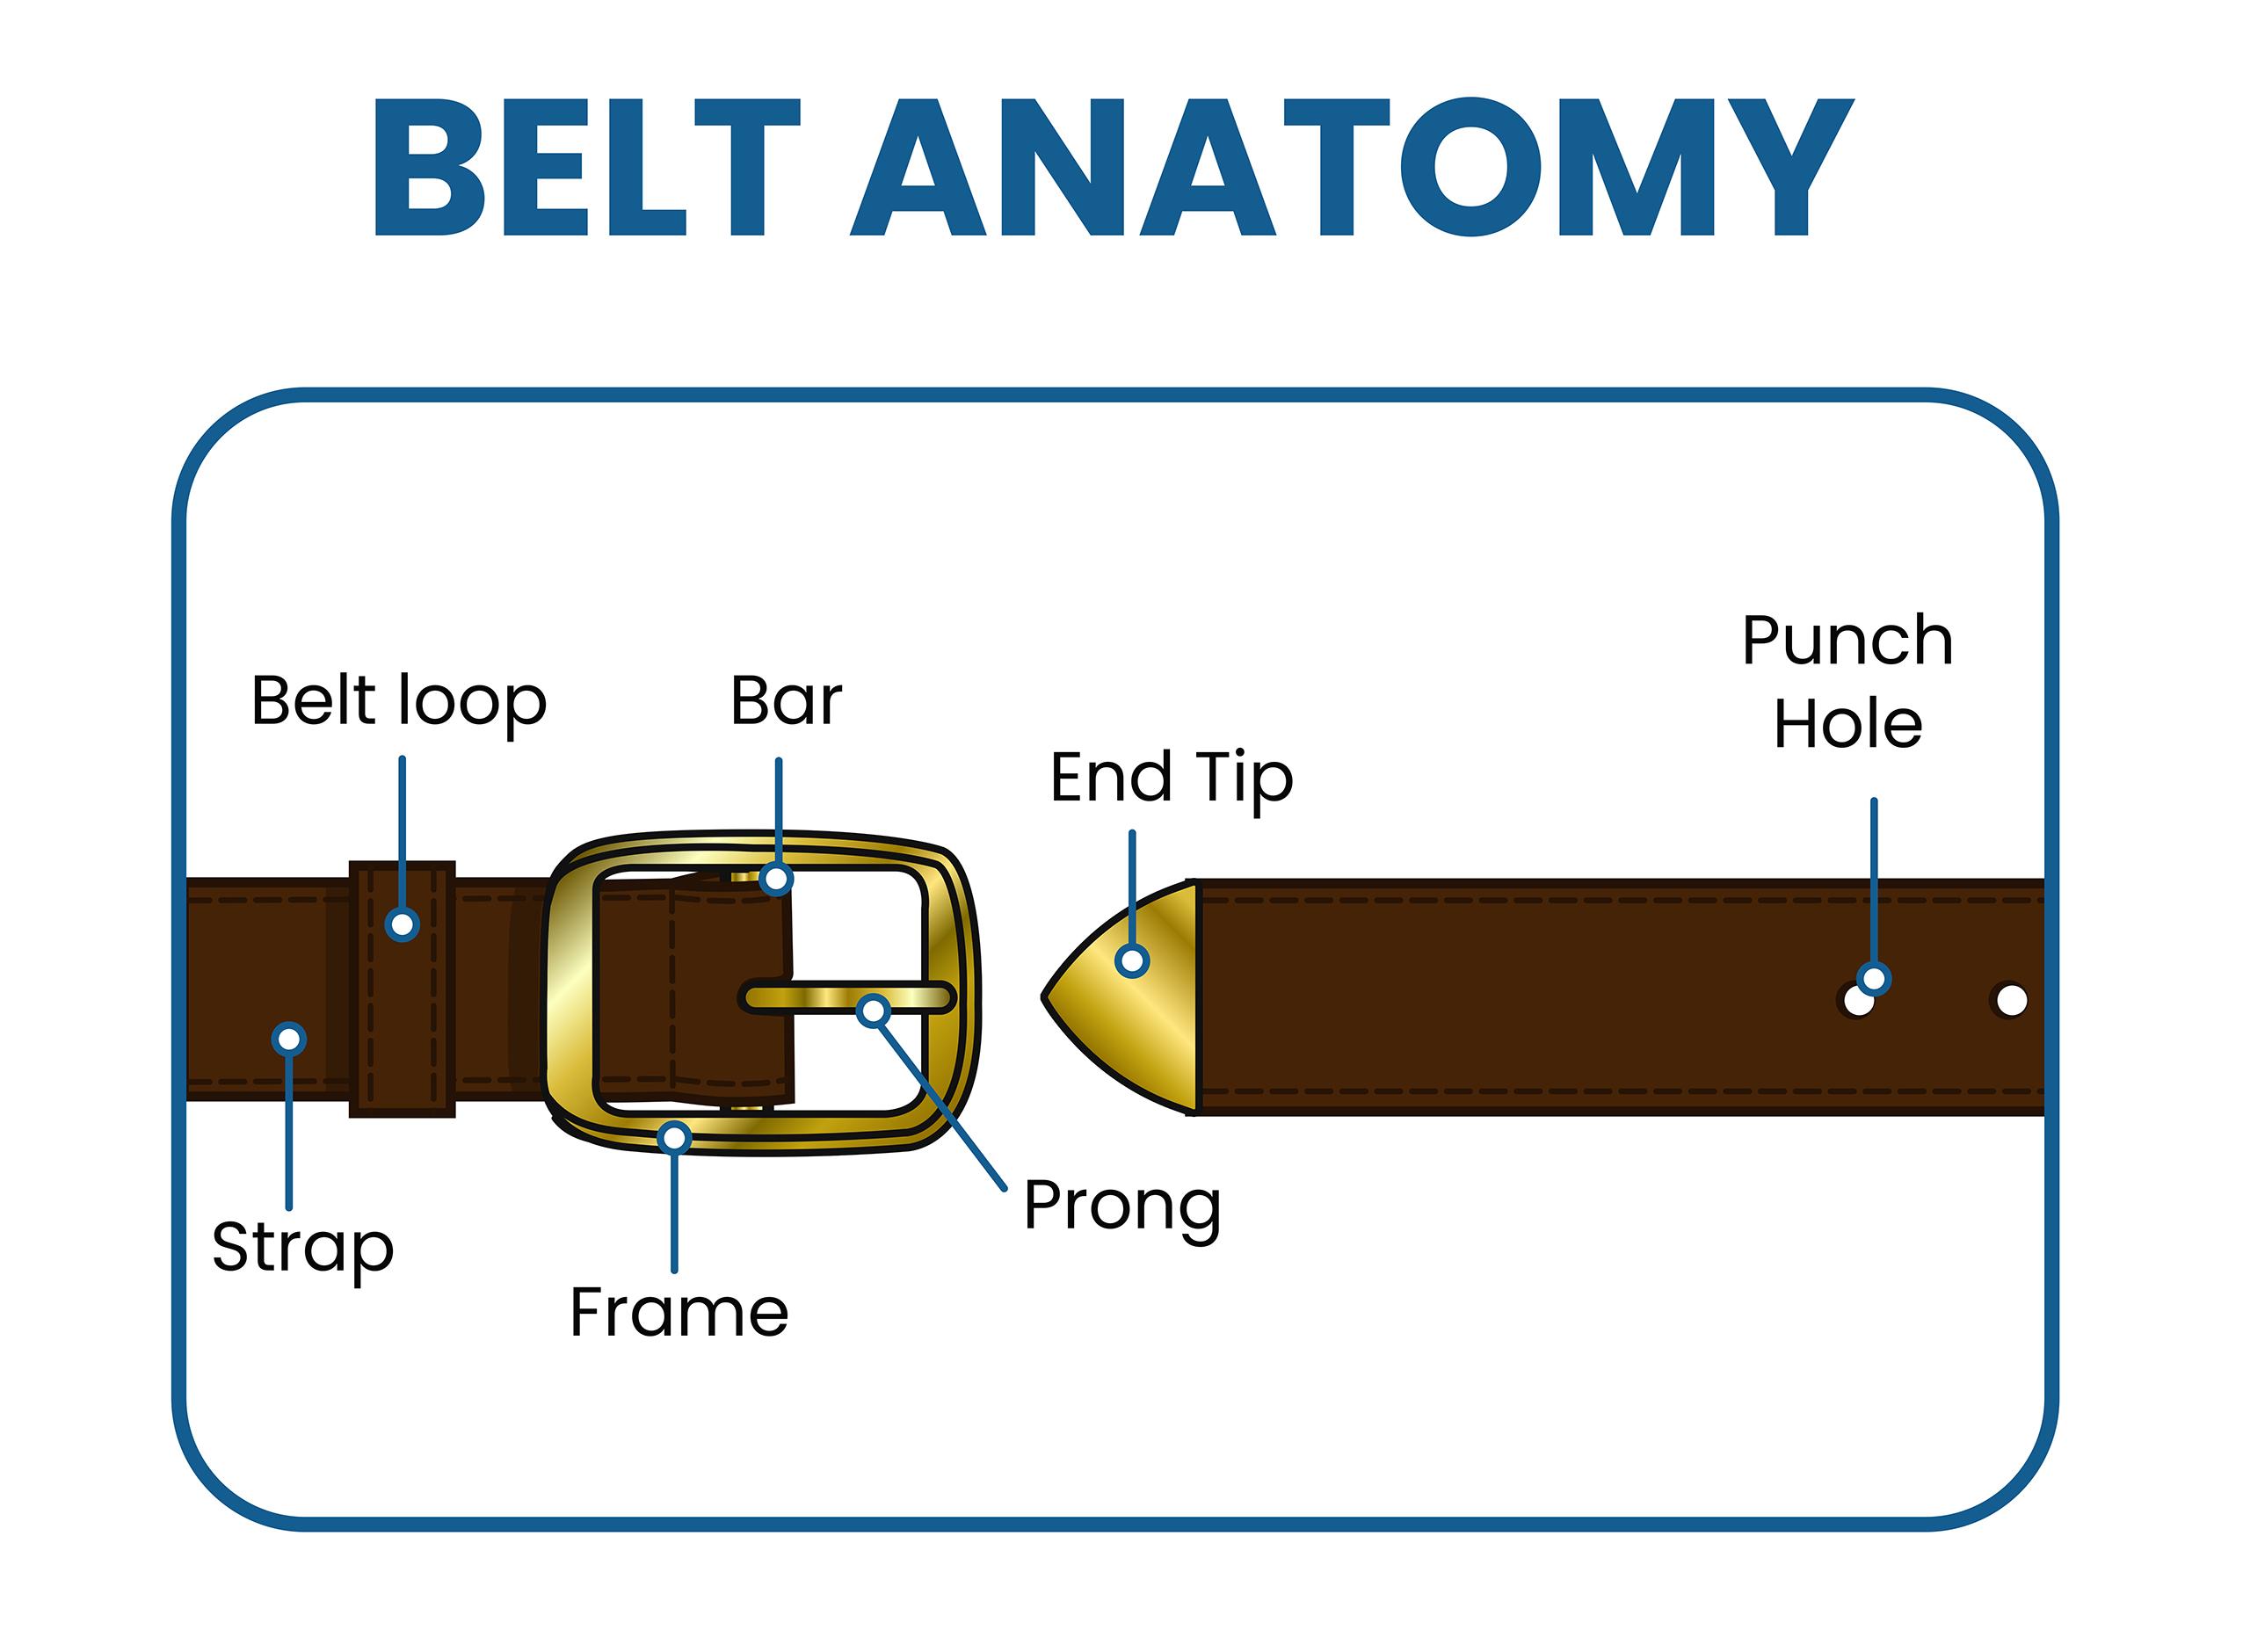 men's belts anatomy: all parts